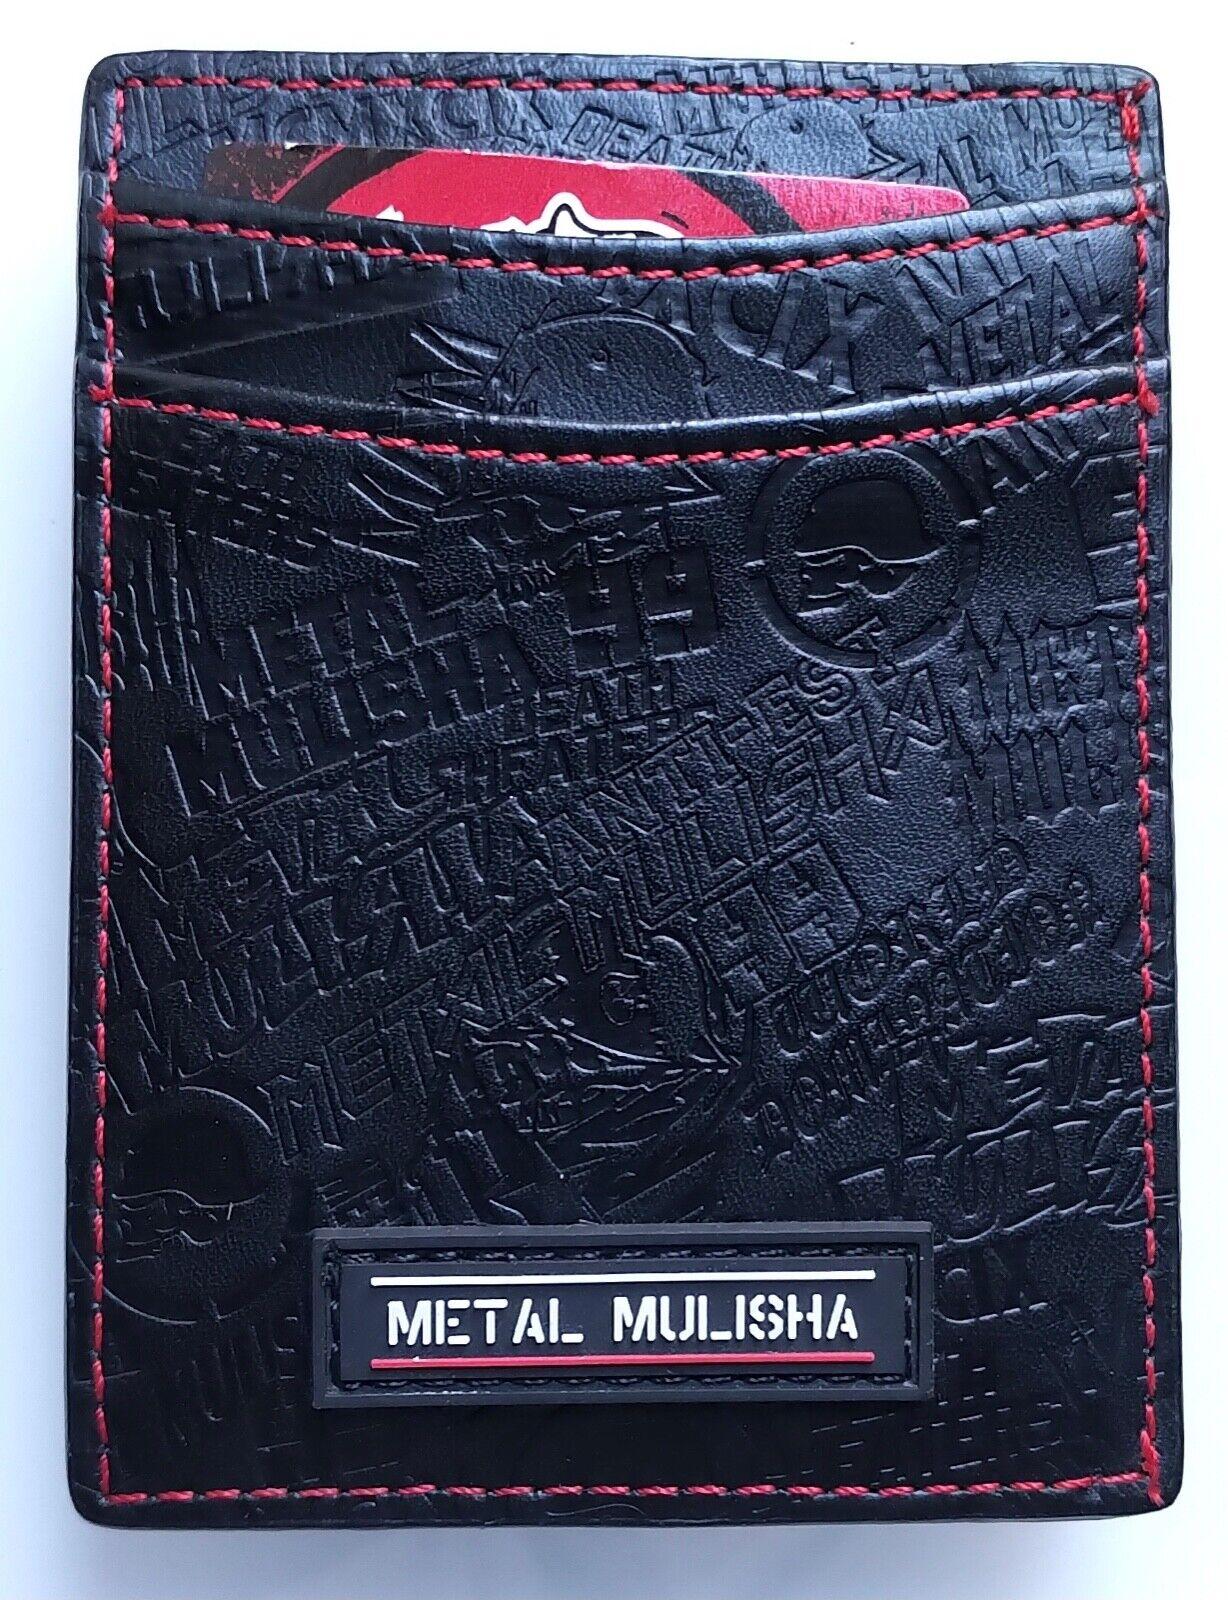 Metal Mulisha Drink Up Wallet, Black